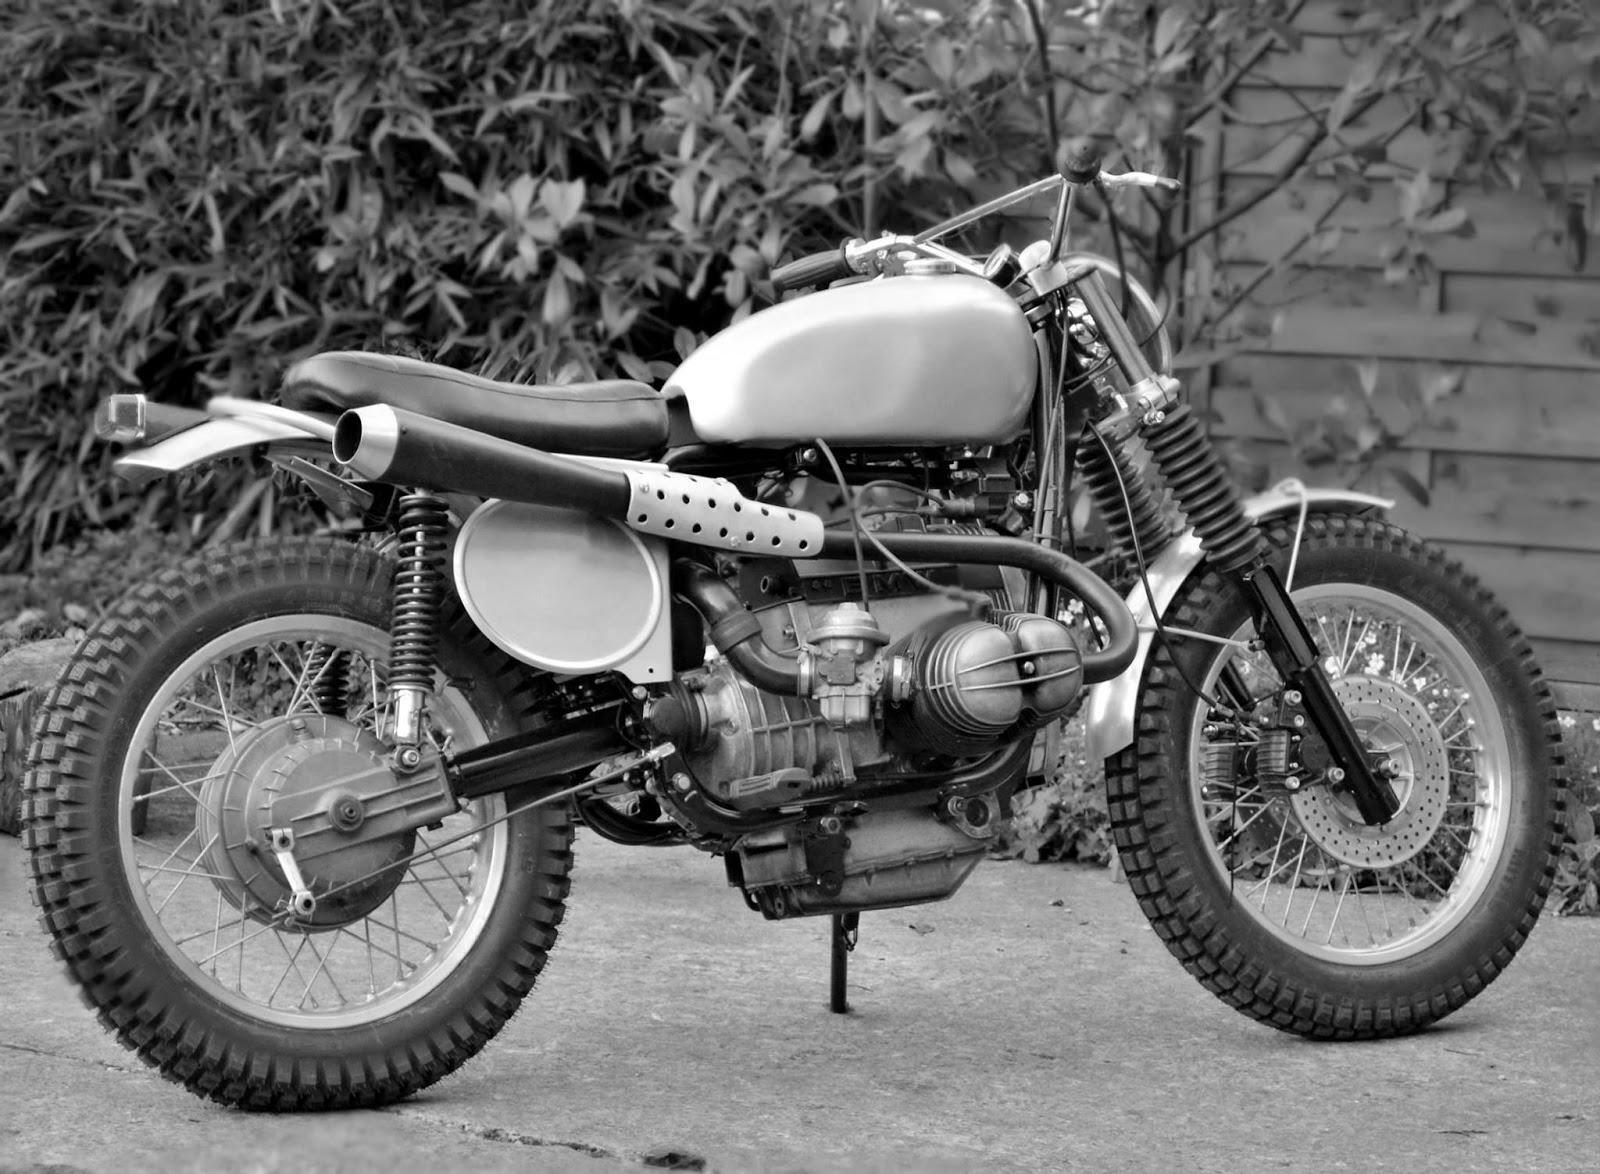 Dust Motorcycles BMW R80 Scrambler TRI BEEMER